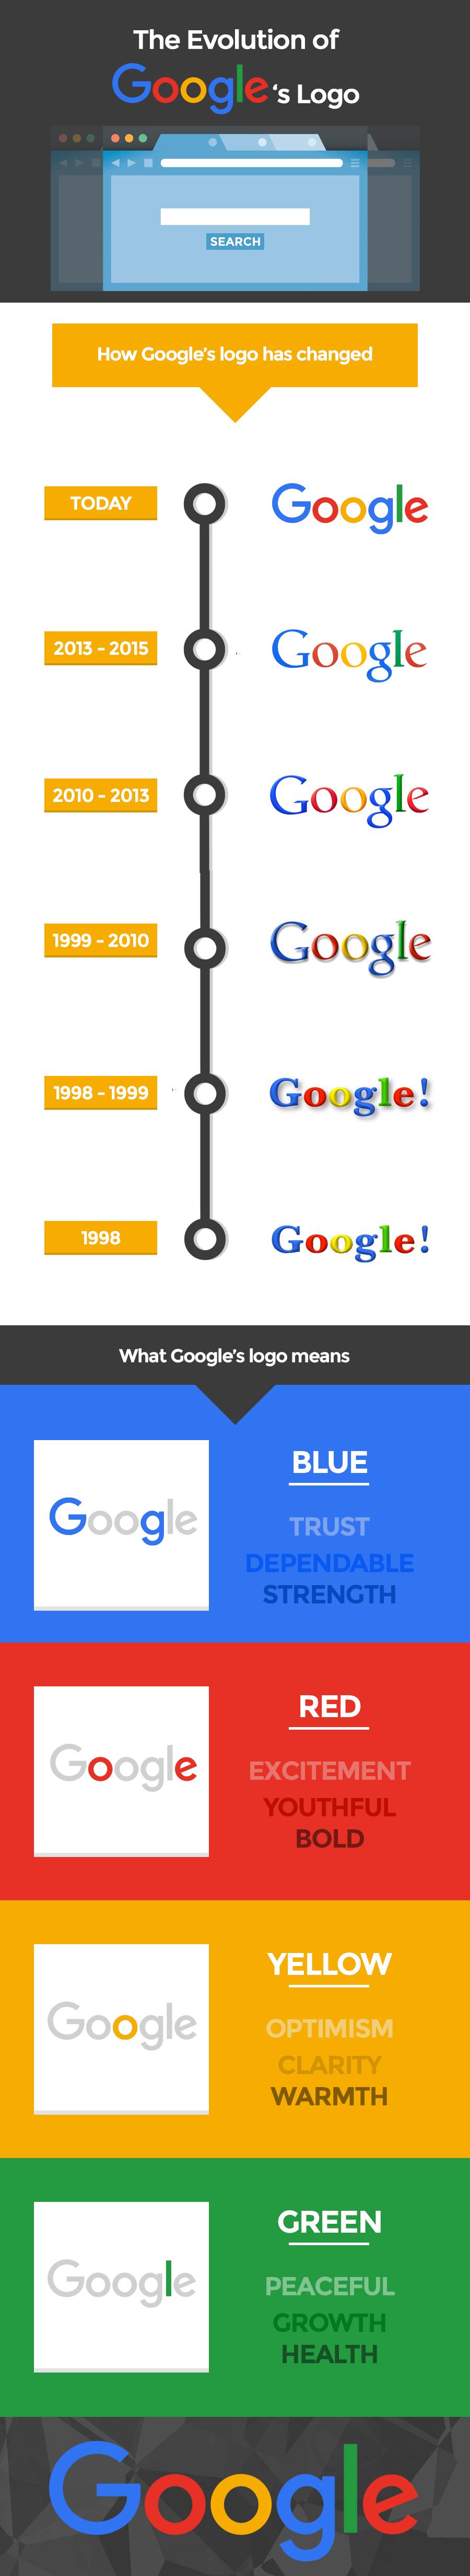 infographie logo Google